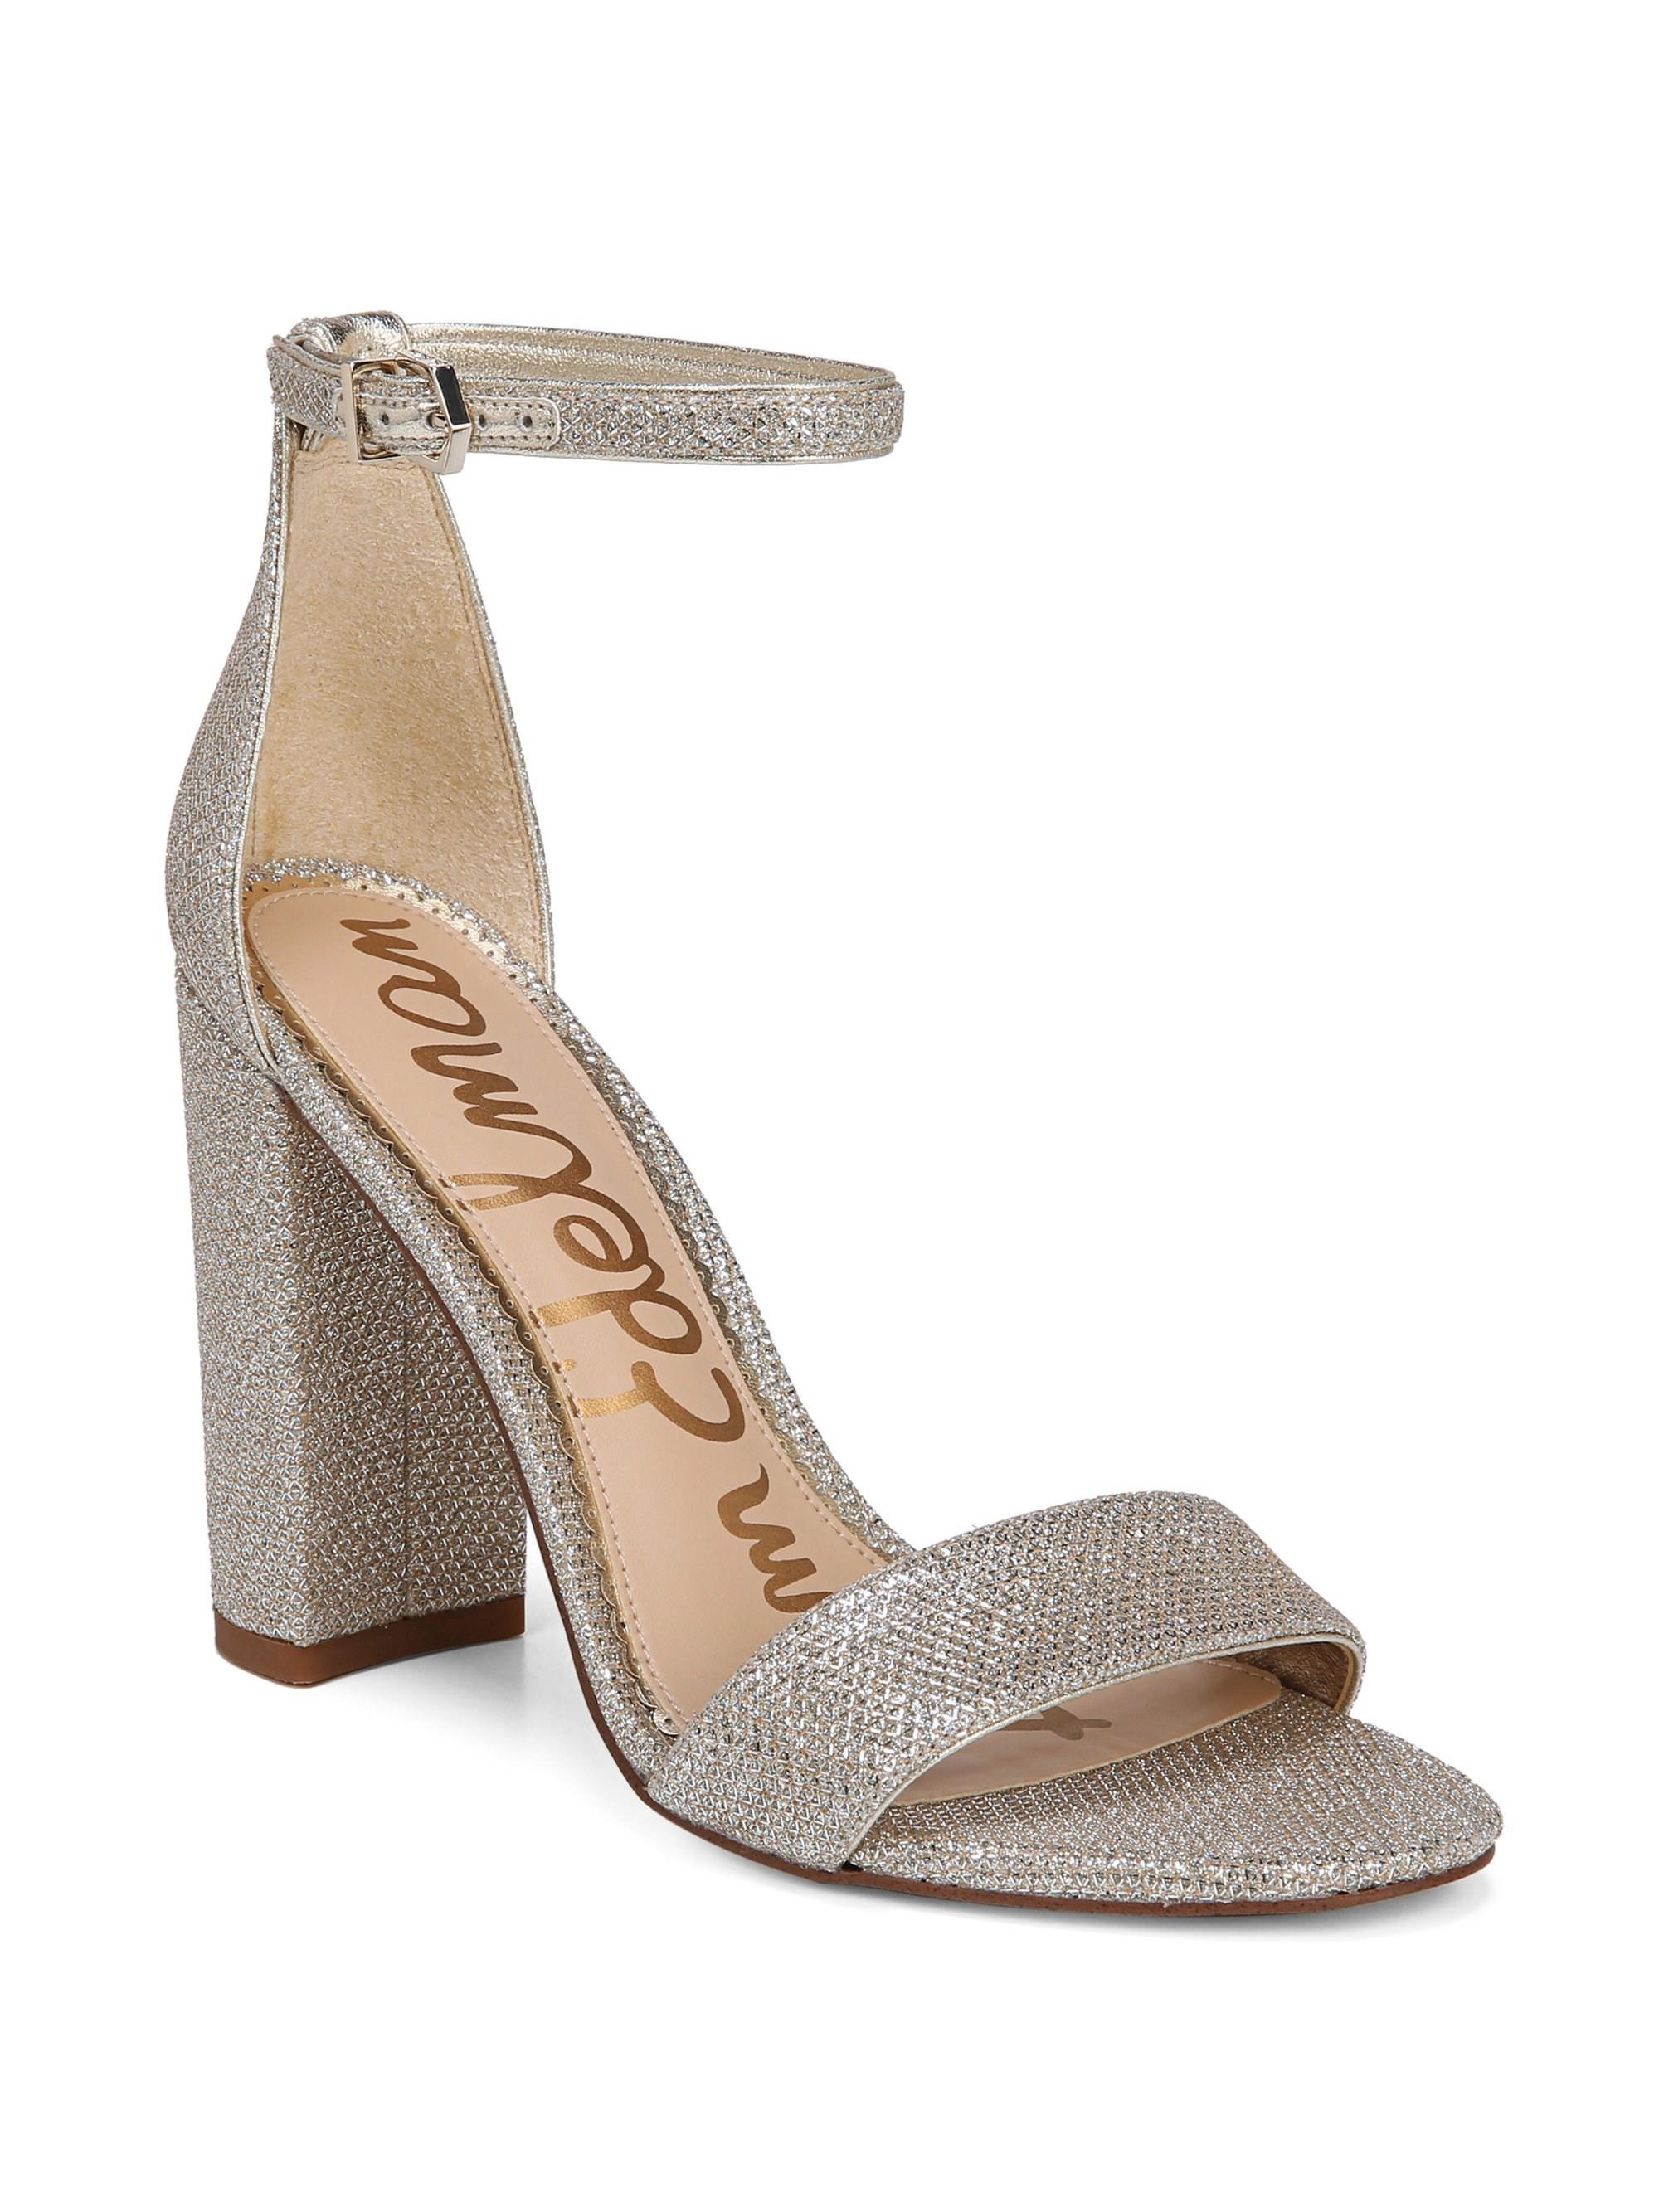 624fbaffe51 Sam Edelman Yaro Metallic Block Heel Sandals - Jute 6